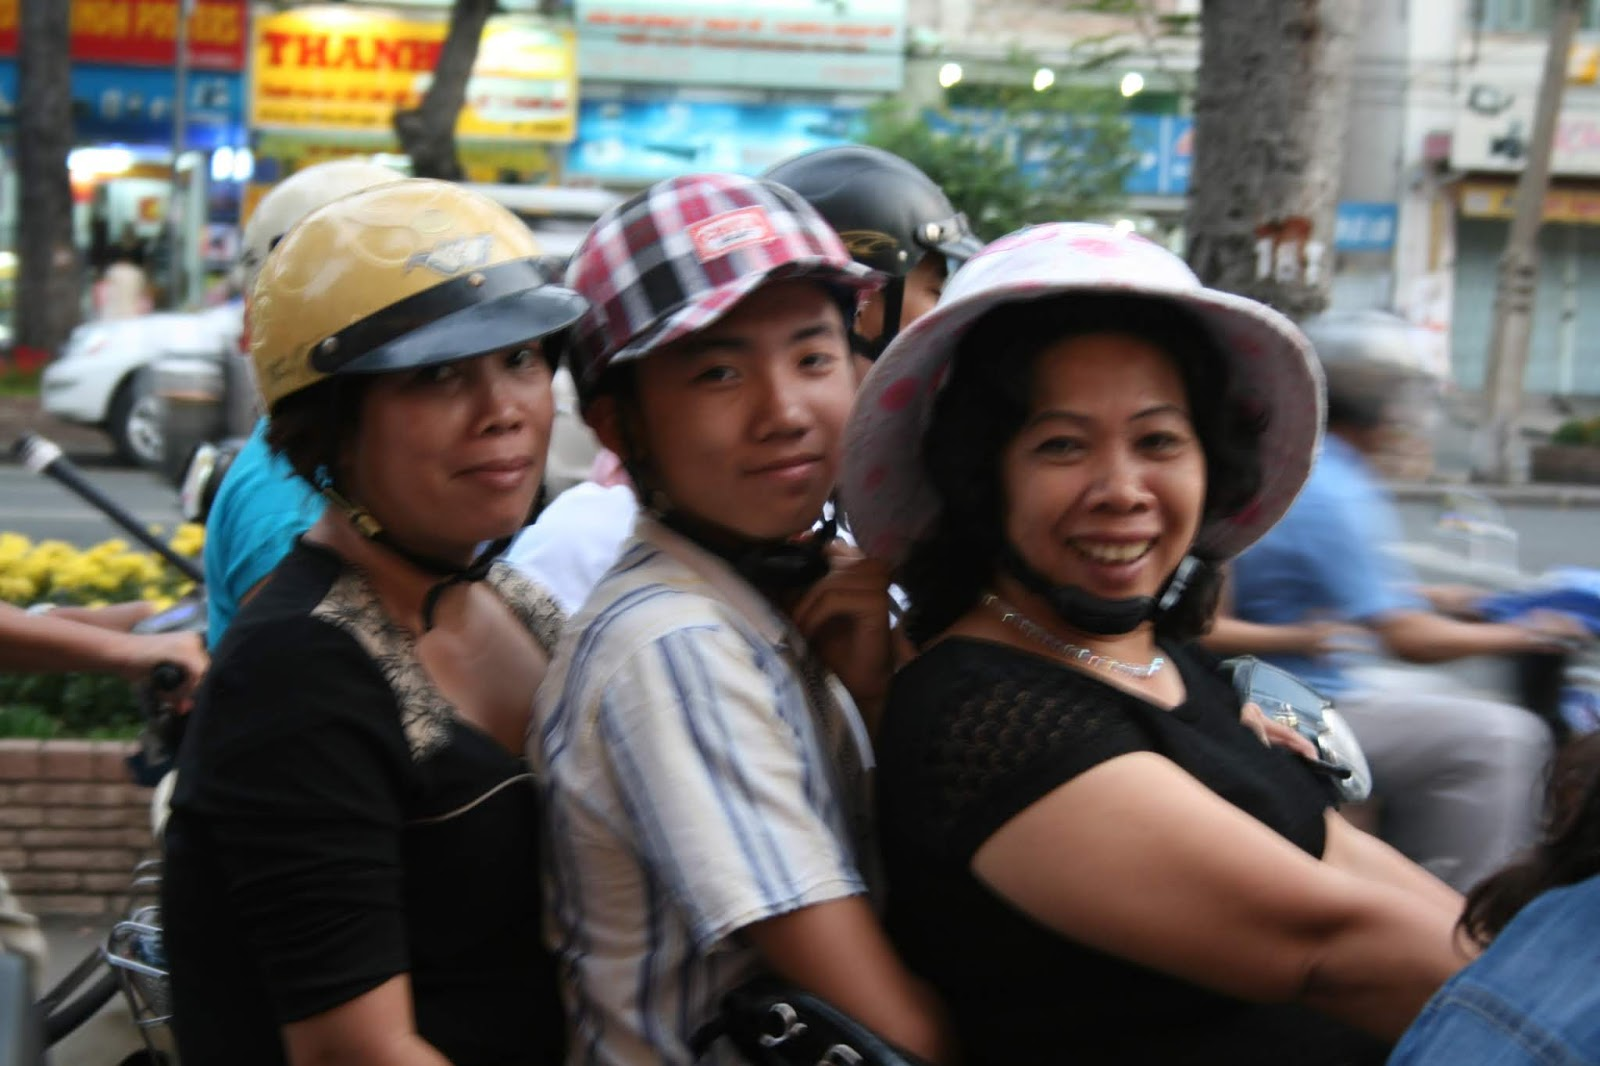 Ho Chi Minh City İşte Vietnam: Motosiklet ve Güleryüzlü insanlar